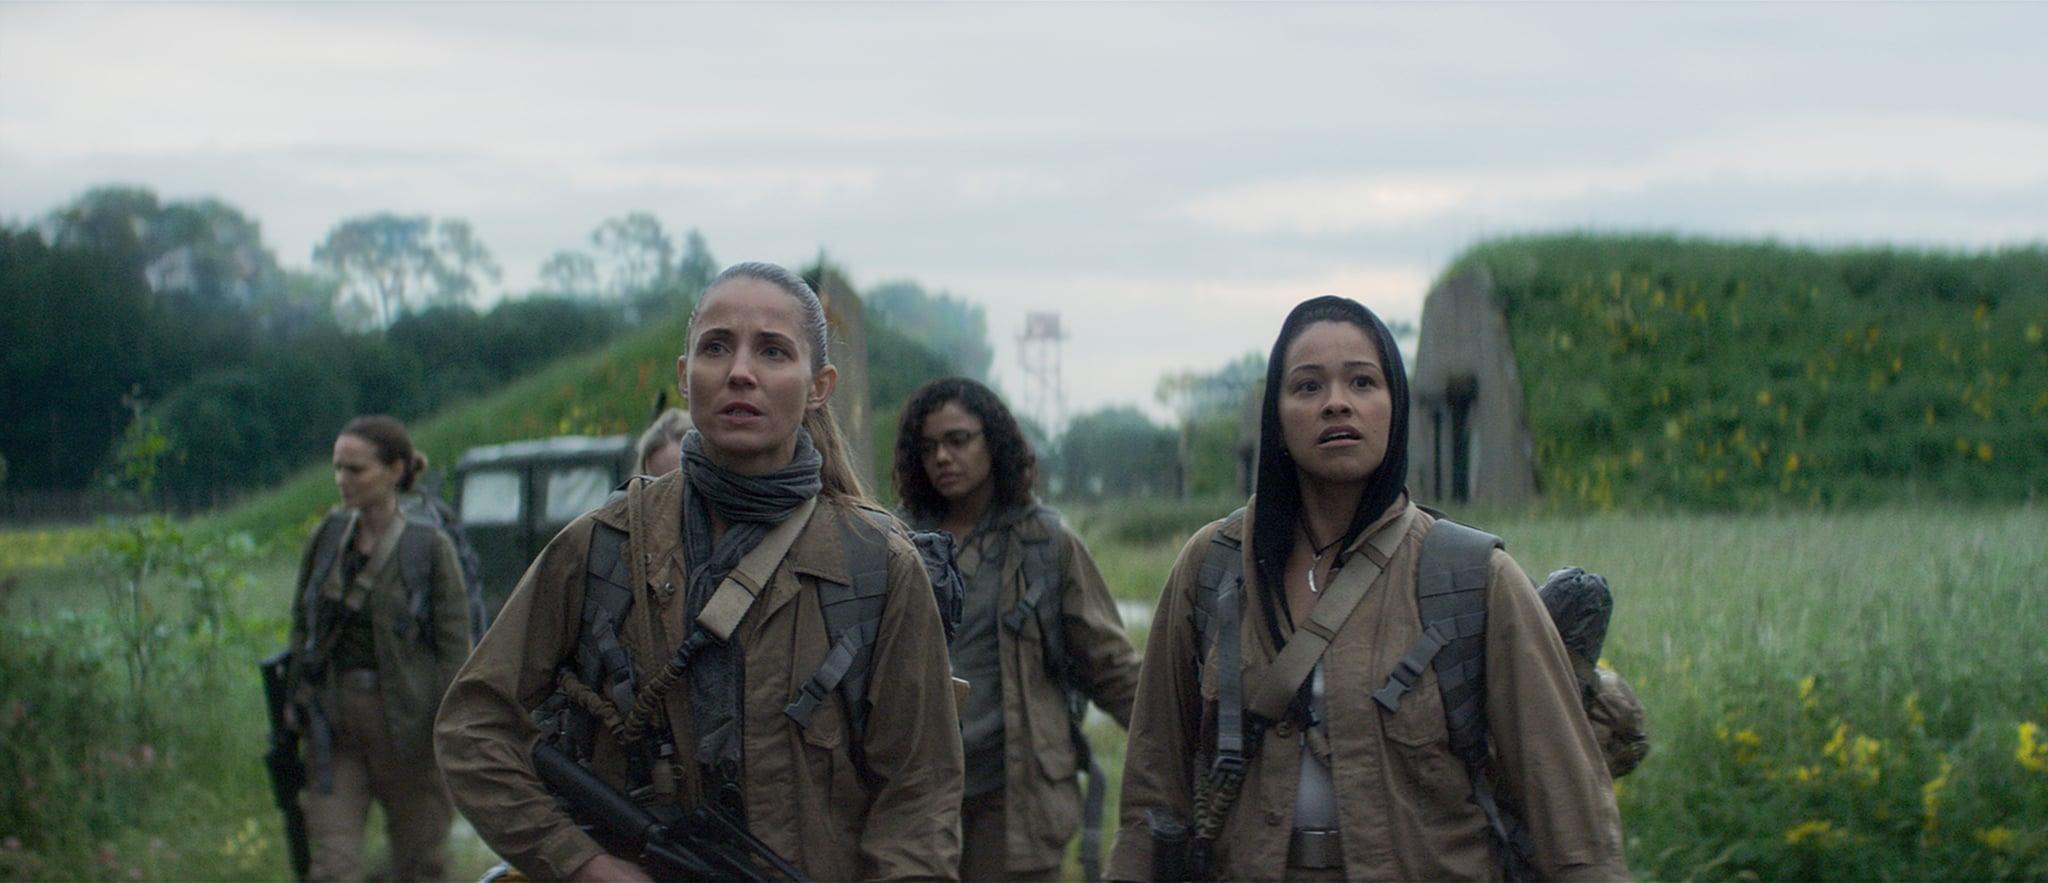 ANNIHILATION, from left: Natalie Portman, Tuva Novotny, Tessa Thompson, Gina Rodriguez, 2018. Paramount Pictures /courtesy Everett Collection